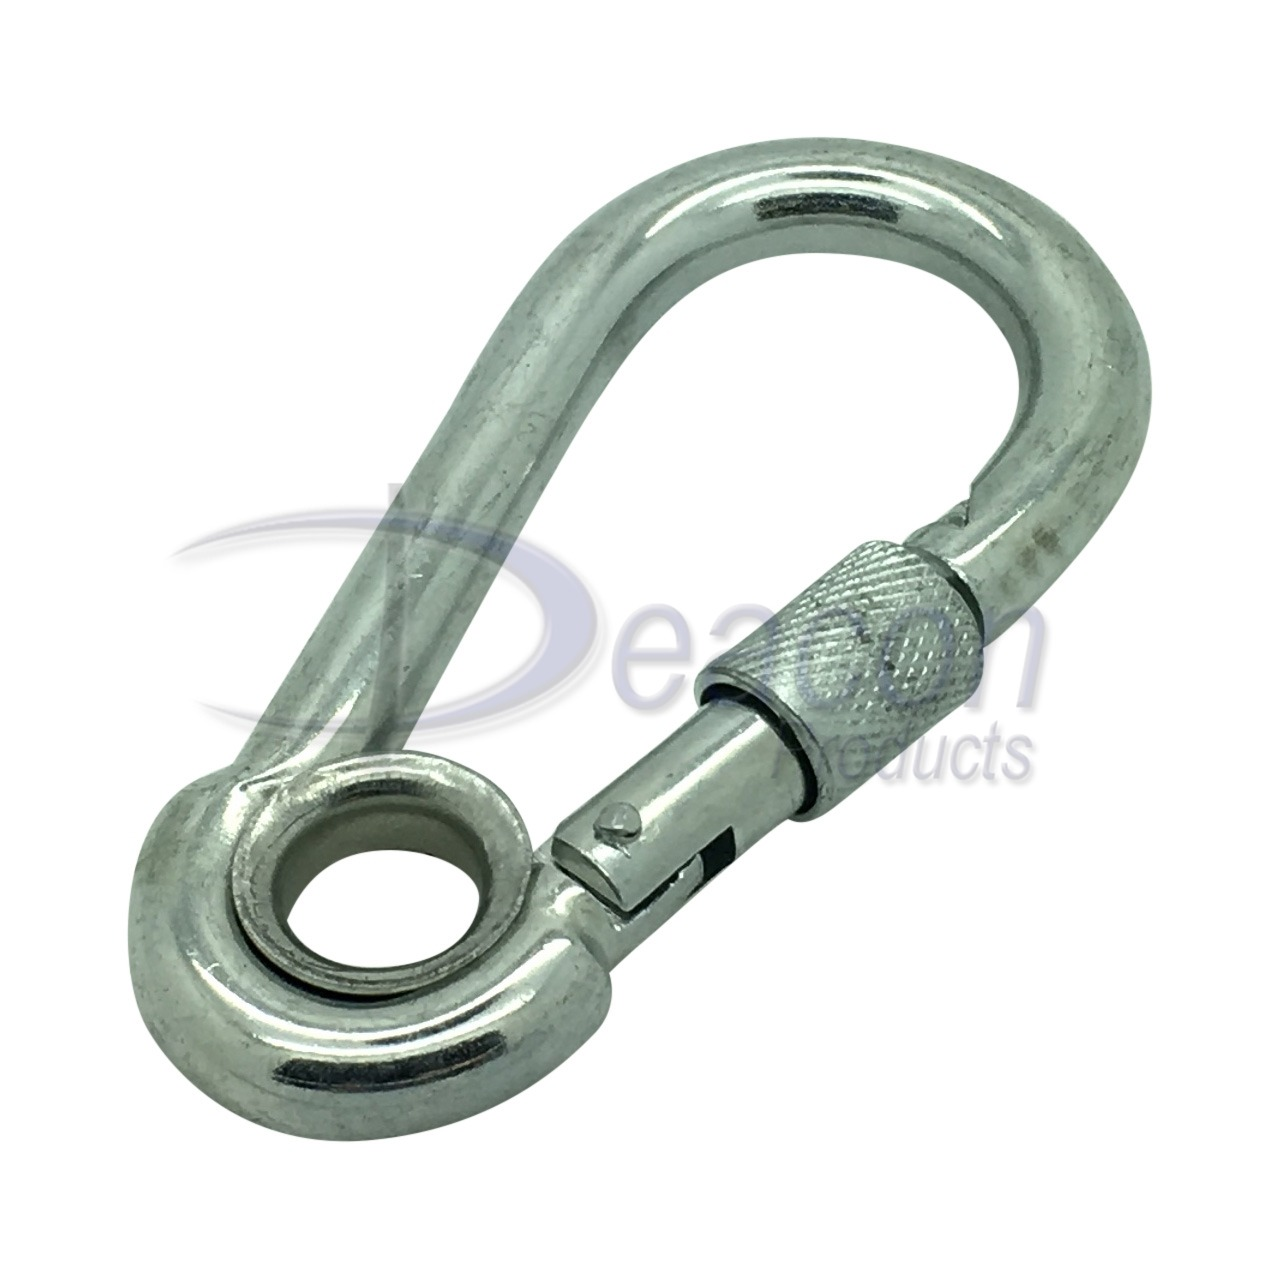 zinc-plated-carbine-hook-eyelet-screwgate